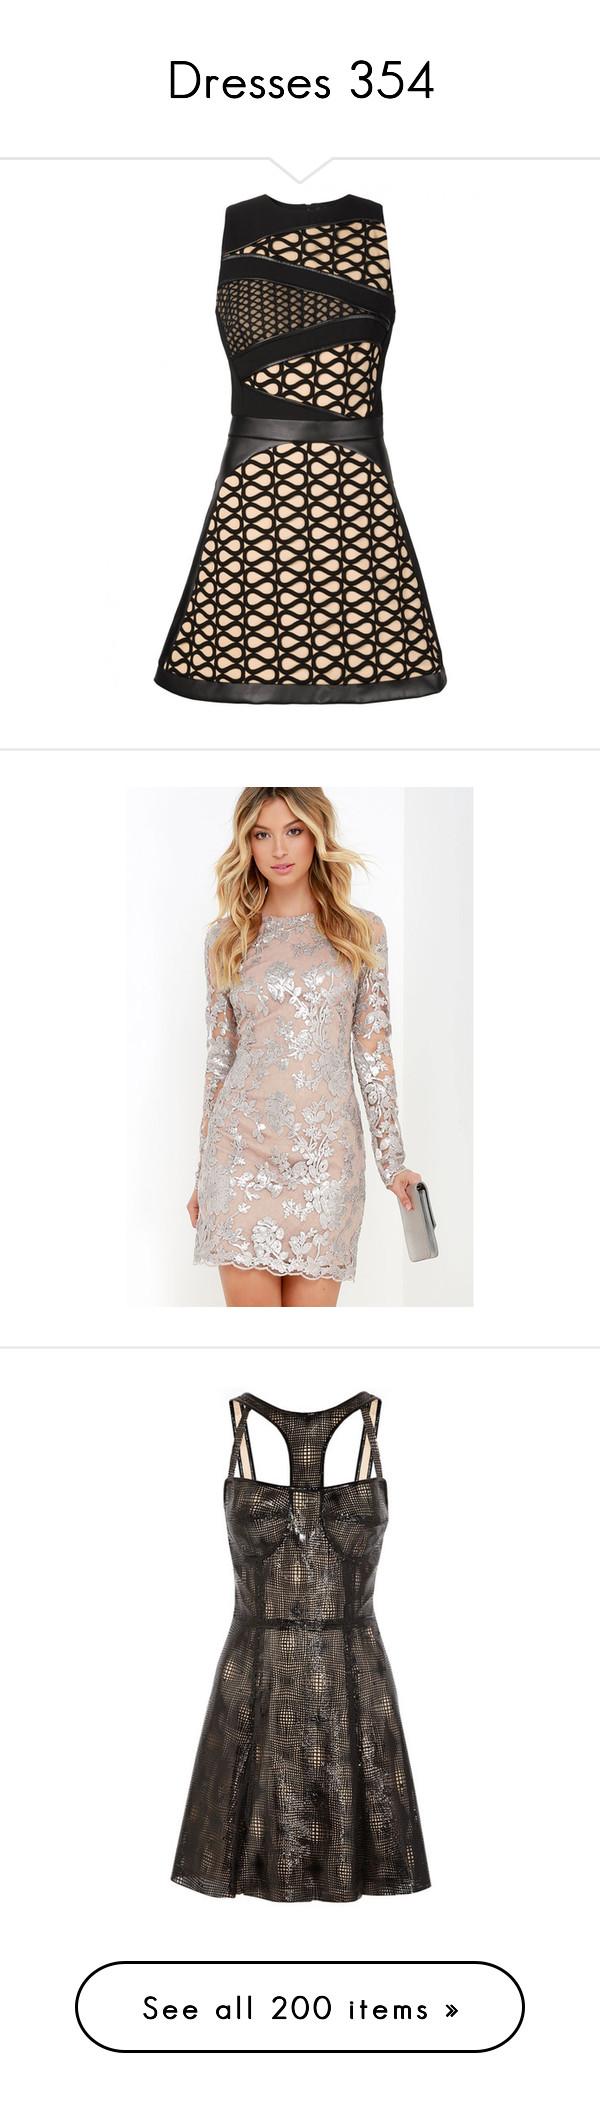 """Dresses 354"" by singlemom ❤ liked on Polyvore featuring dresses, david koma dress, black sleeveless dress, no sleeve dress, sleeveless dress, david koma, silver, white dress, sheer long sleeve dress and white sheer dress"